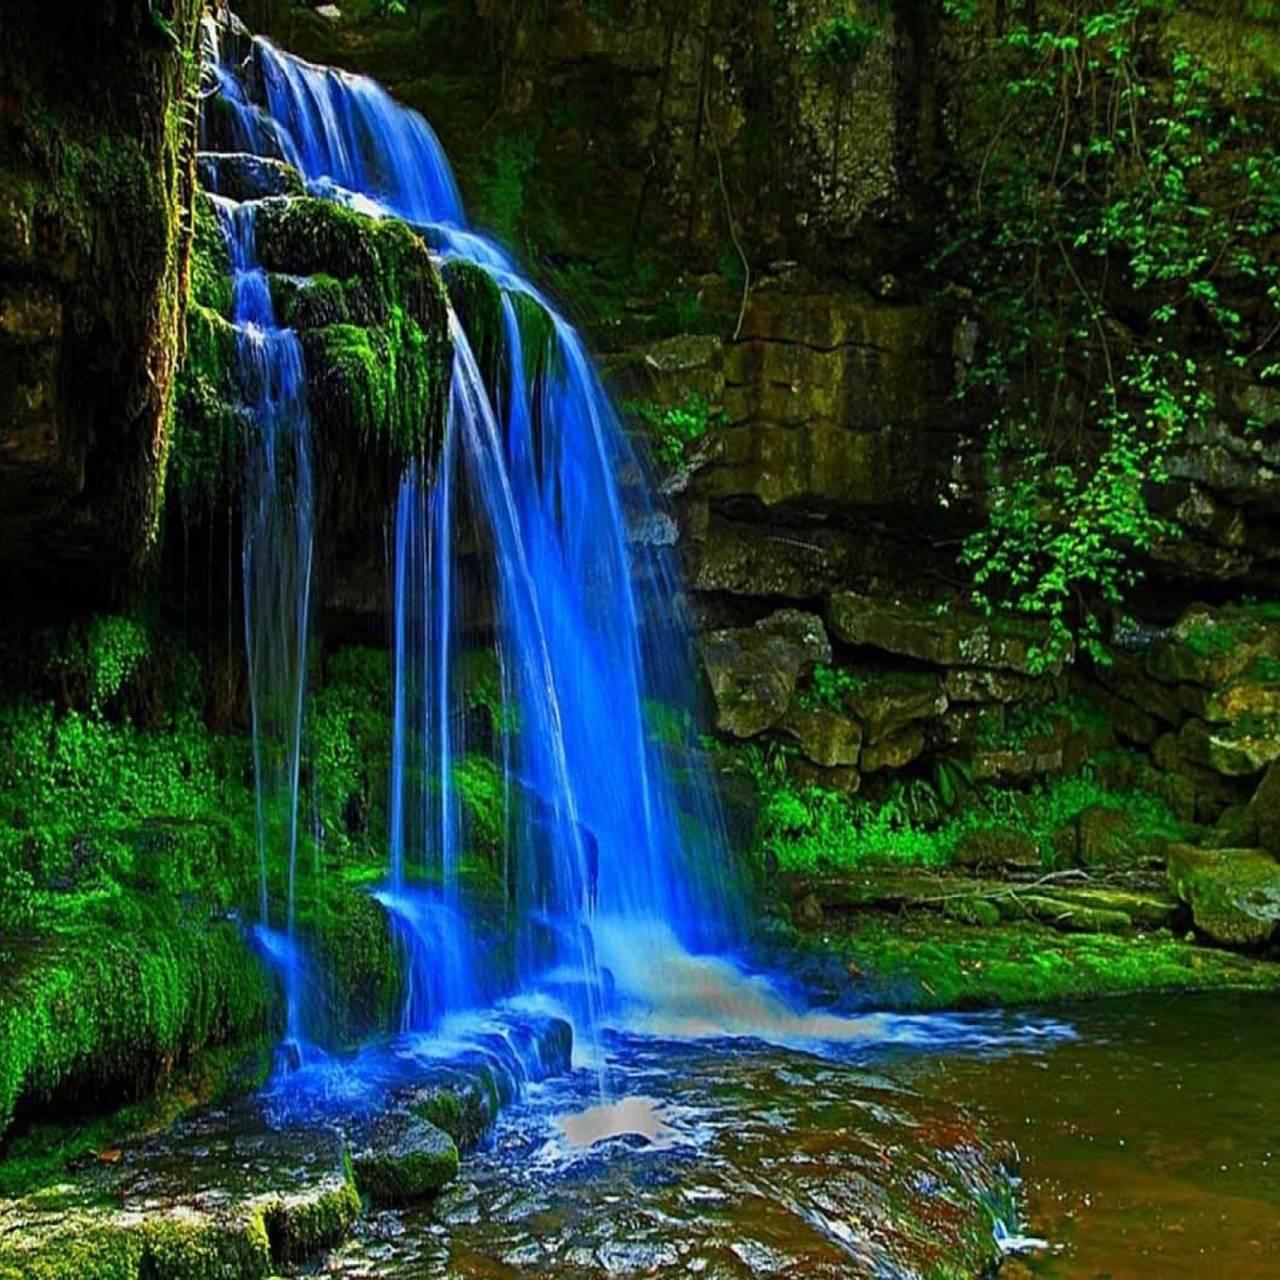 Deep in Rainforest